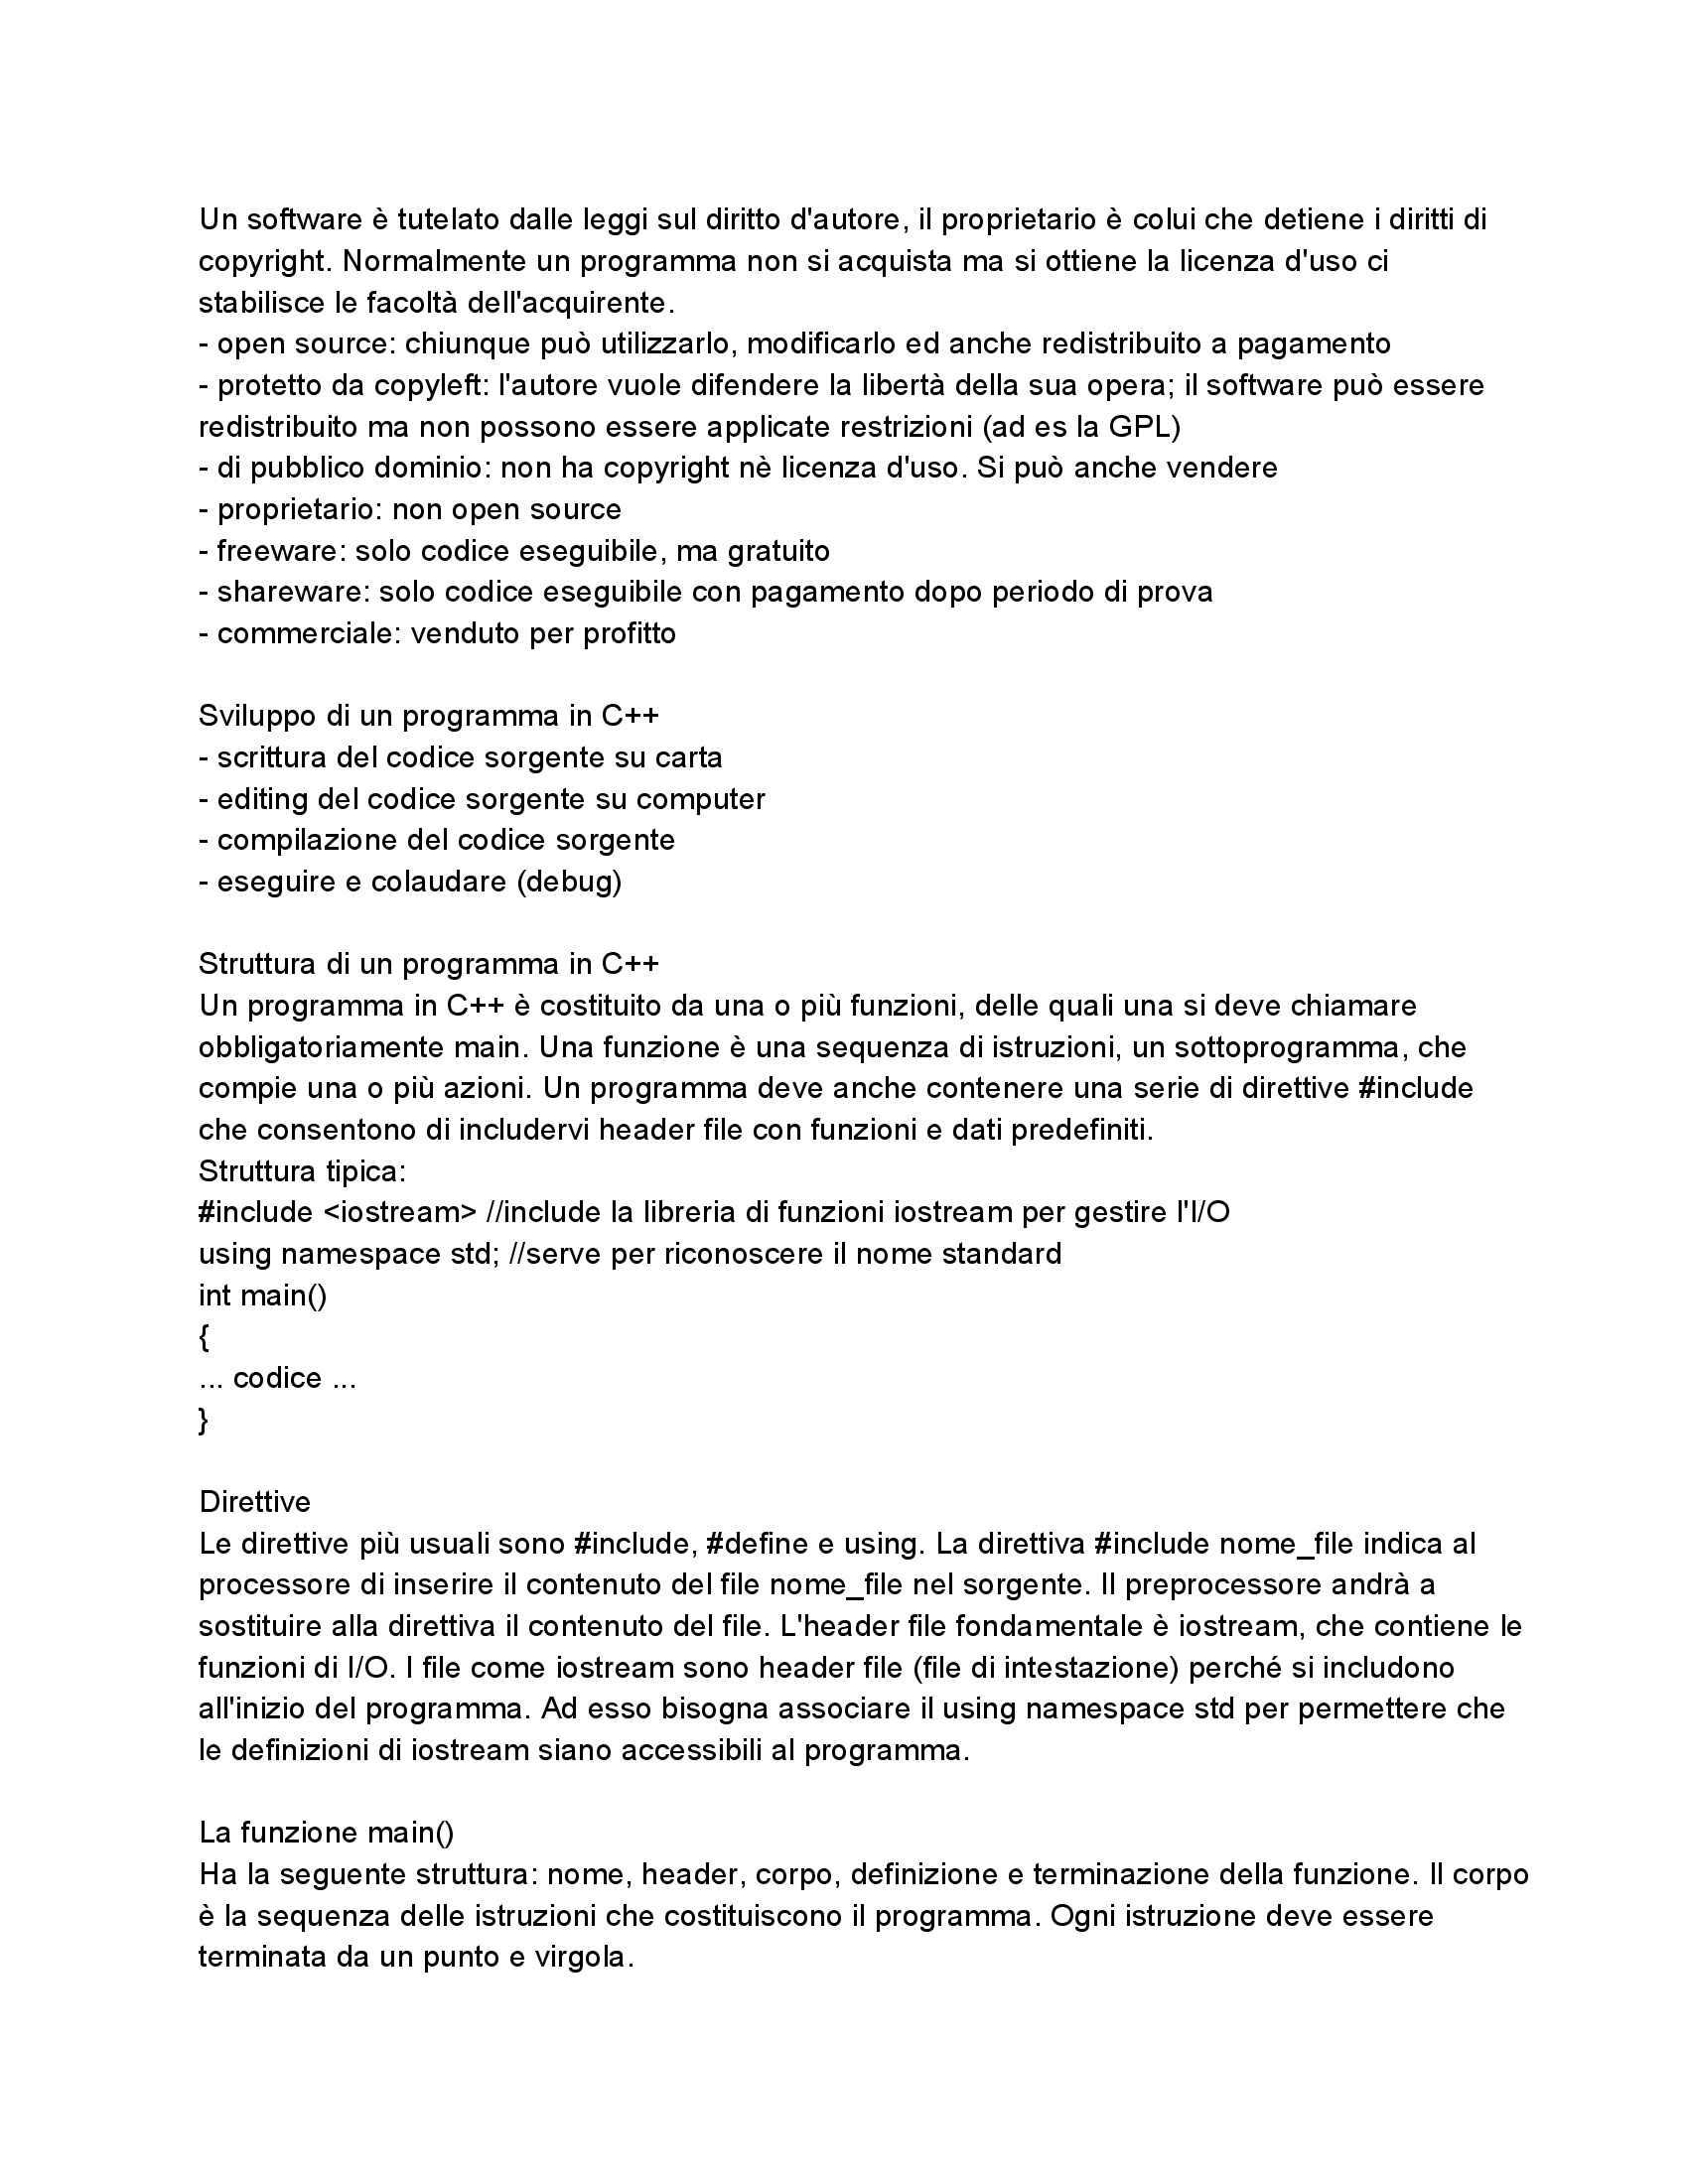 Riassunto esame Fondamenti di Informatica: Manuale di C/C++, prof. Dragoni Pag. 2